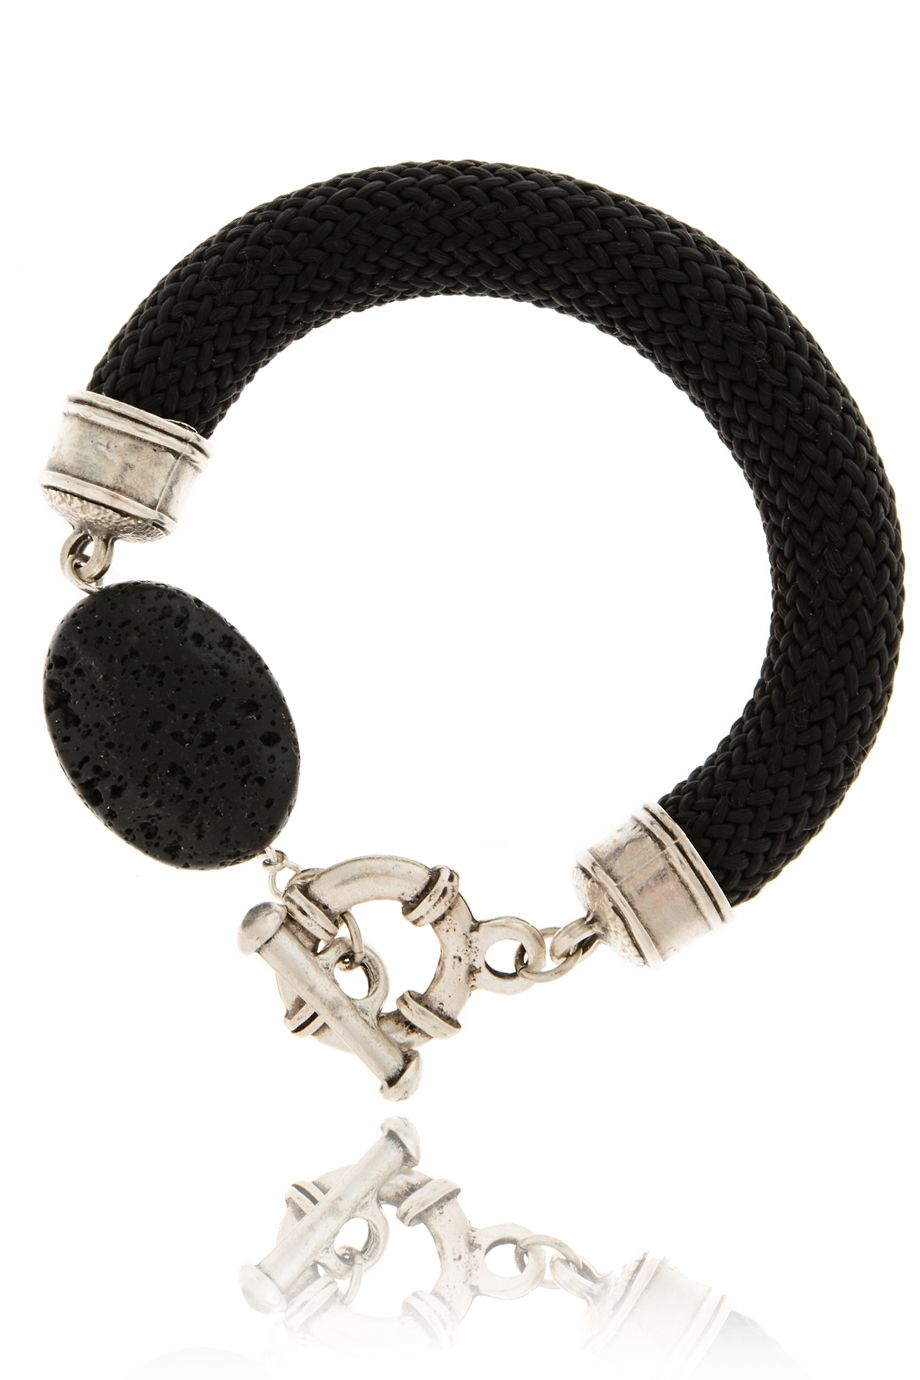 BEHIND THE ROPES LIVANA Black Lava Stone Bracelet - ACCESSORIES | JEWELRY | Bracelets | PRET-A-BEAUTE.COM